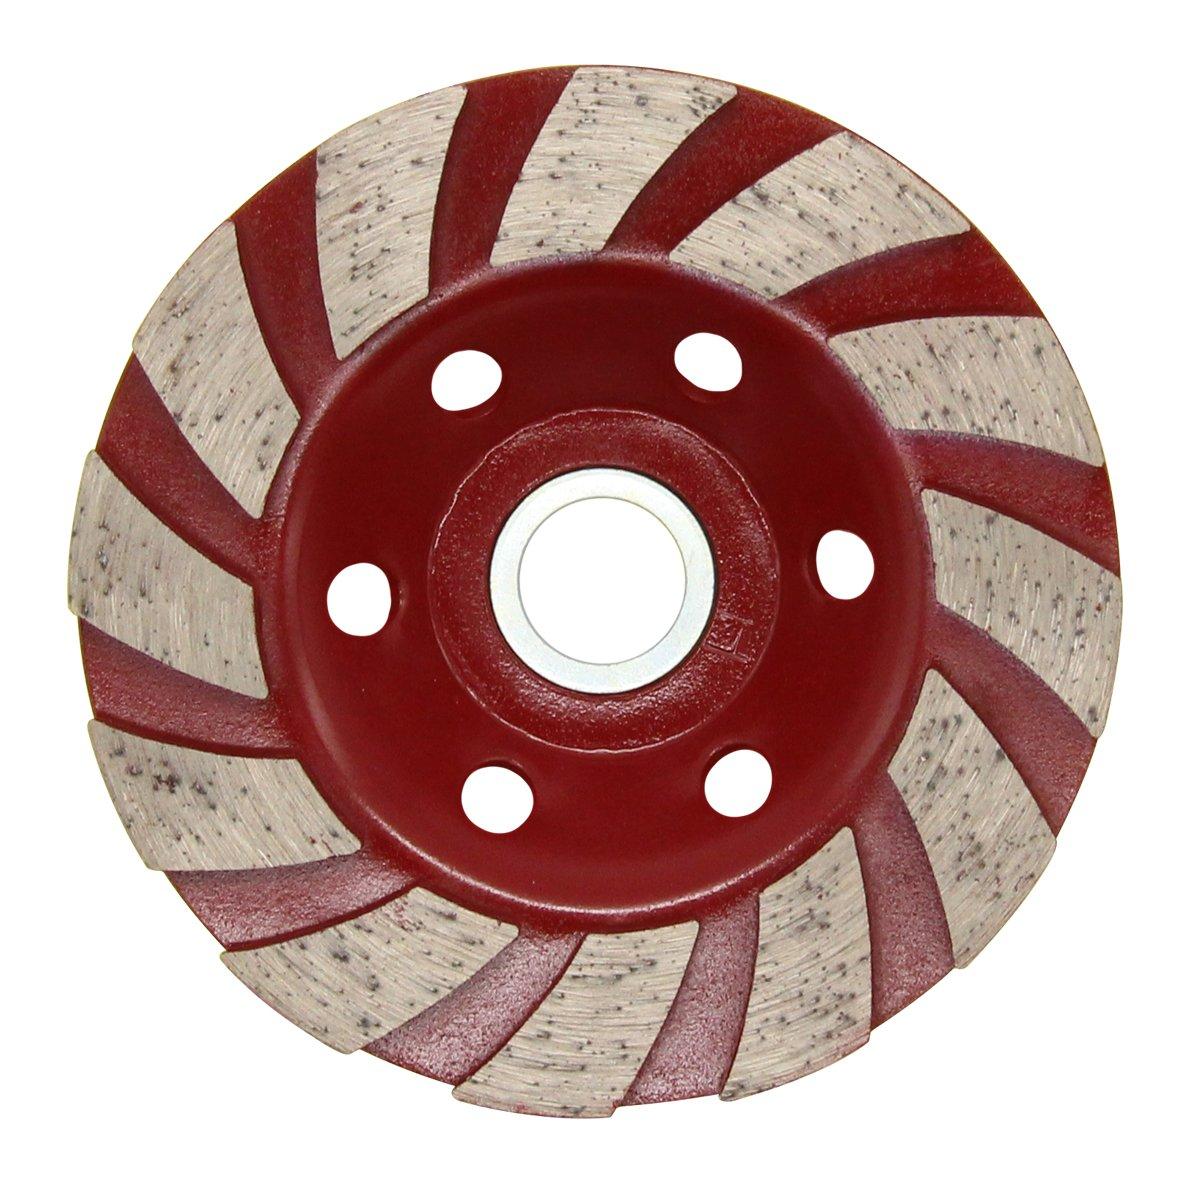 Latinaric 12 Segs 110mm 4.3 Concrete Turb Diamond Grinding Cup Wheel Disc Masonry Stone Cutting Tool For Angle Grinder Black